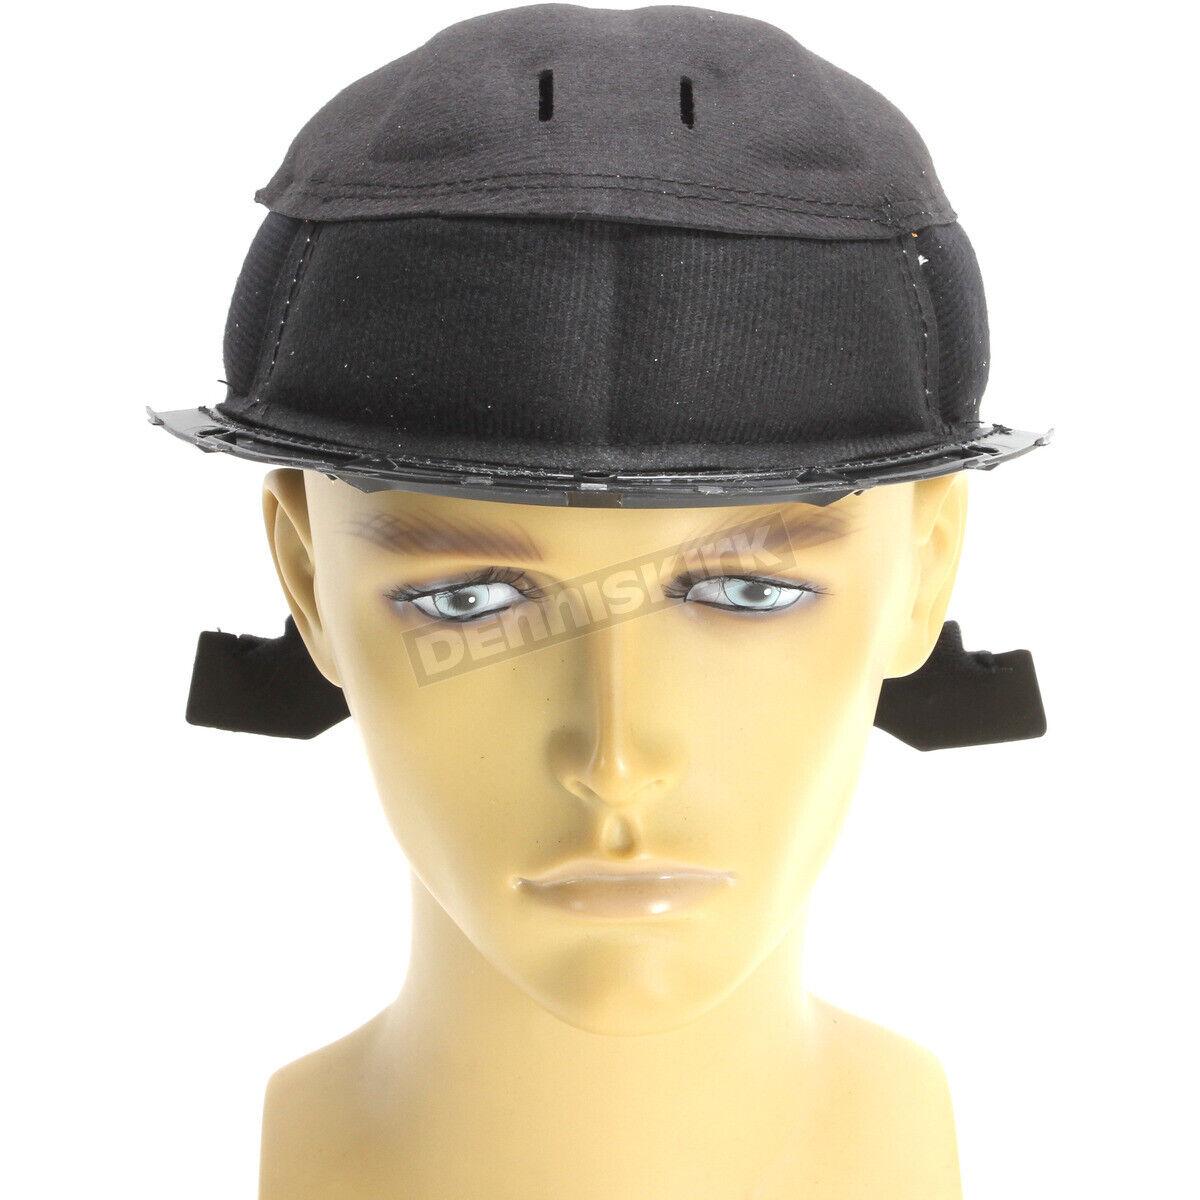 Black, X-Small LS2 Helmets Liner for FF385//396 FT2 Helmets